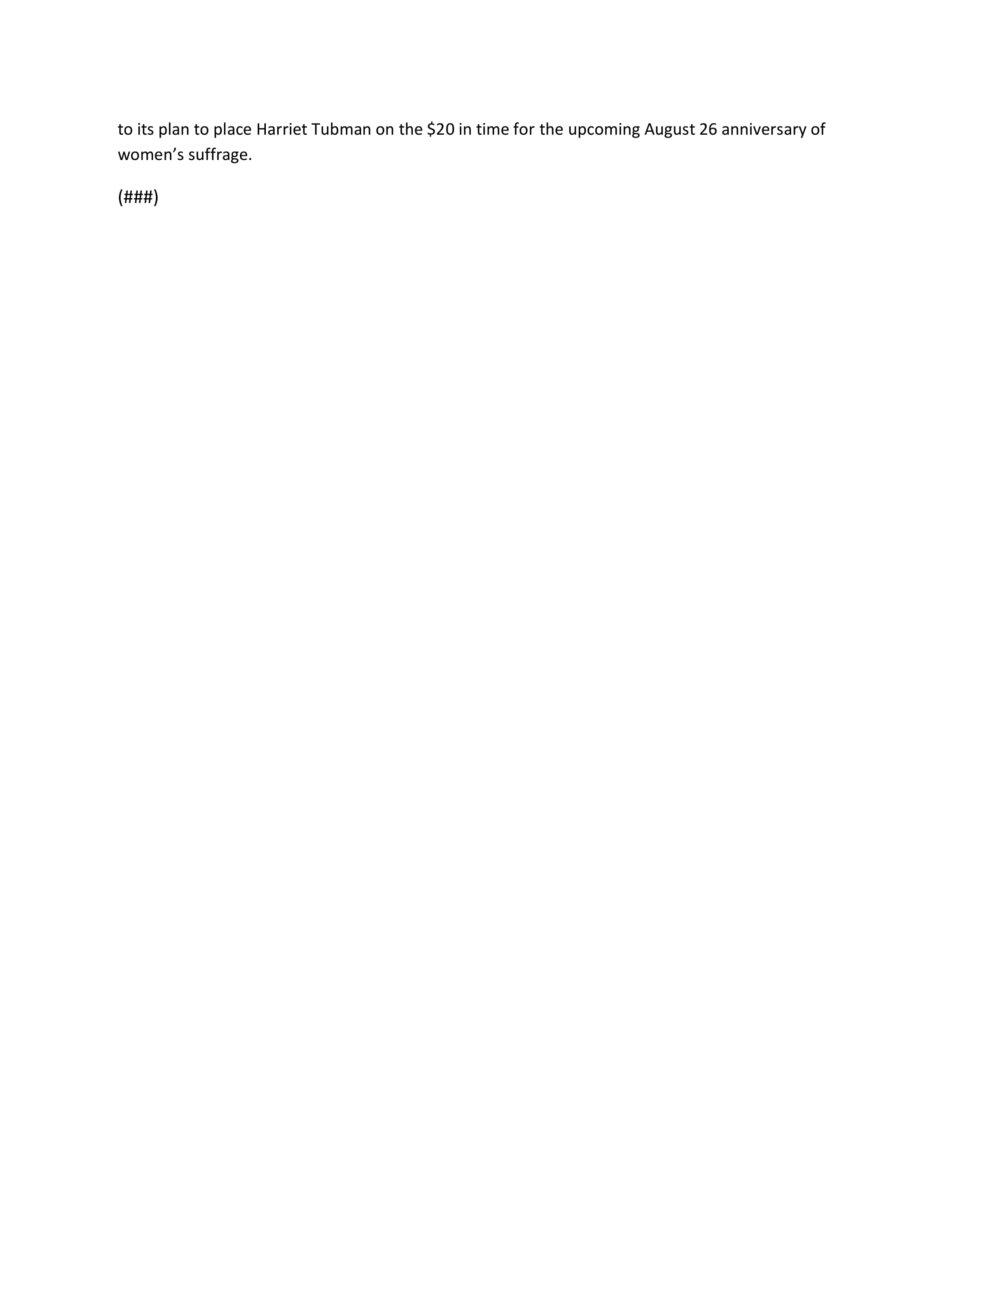 Cobbs_Tubman release final-2.jpg